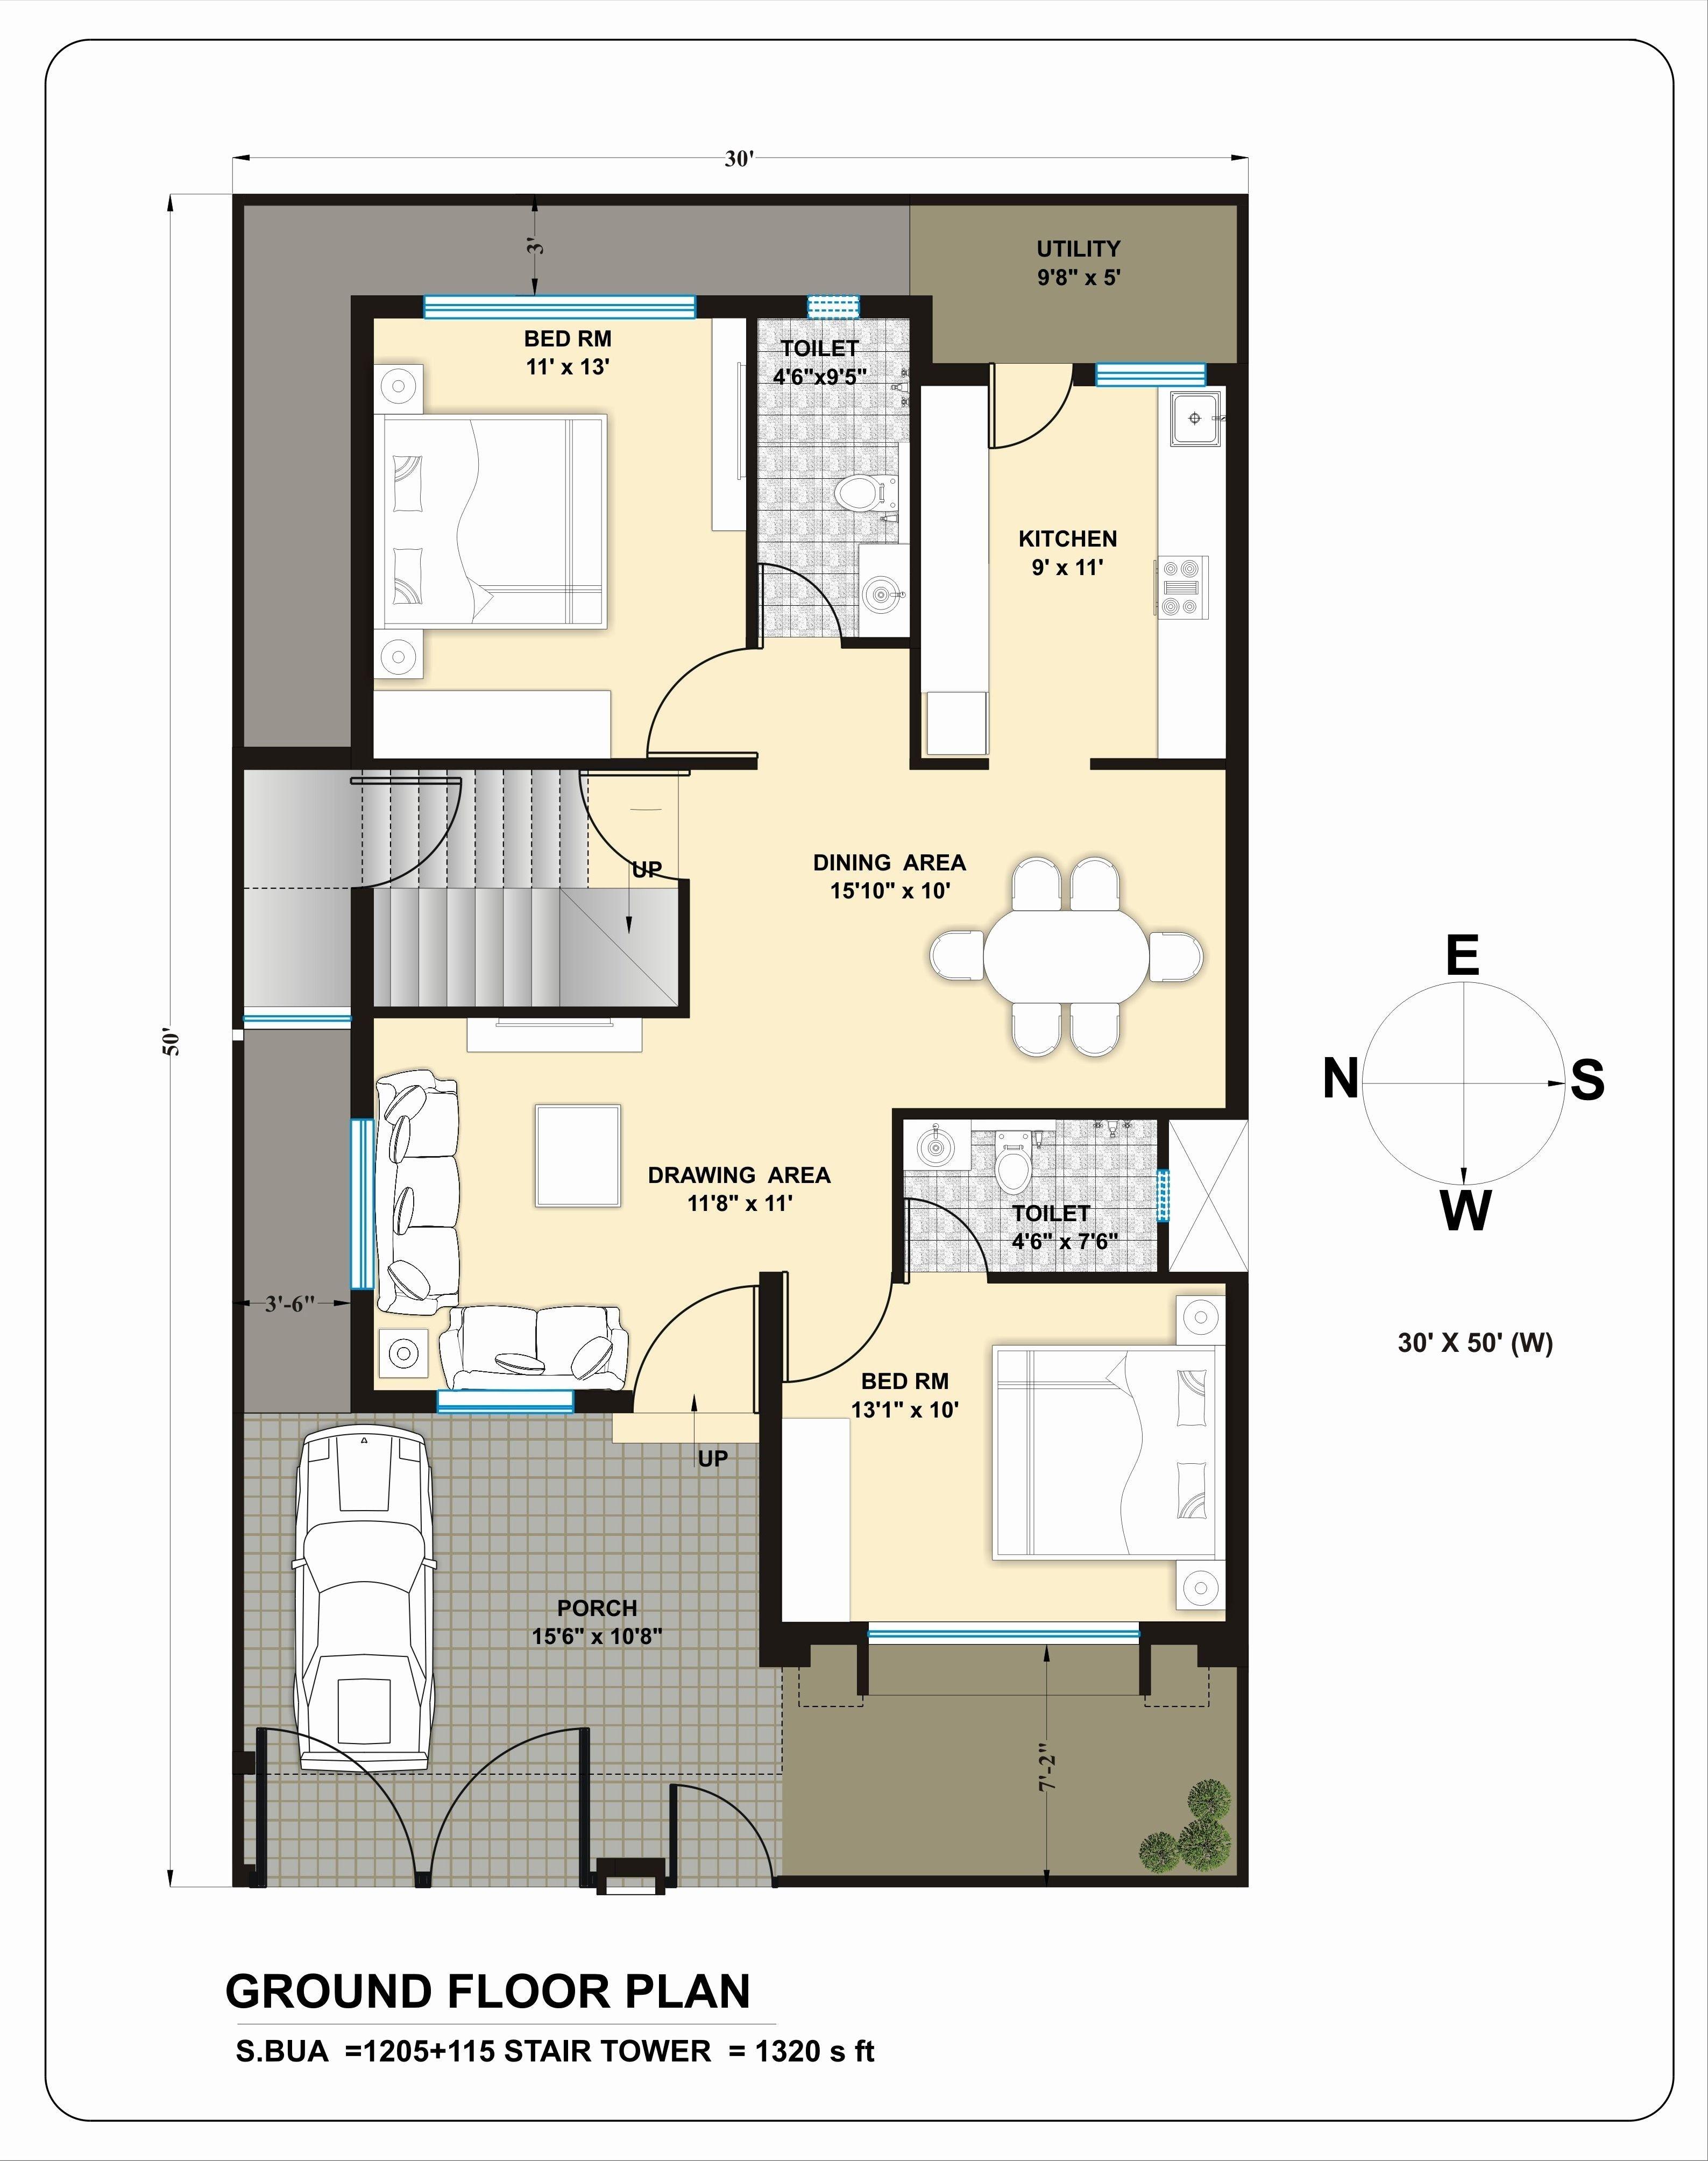 Gorgeous best of house plans floor concept bright by west facing also varun kori prakashhari on pinterest rh